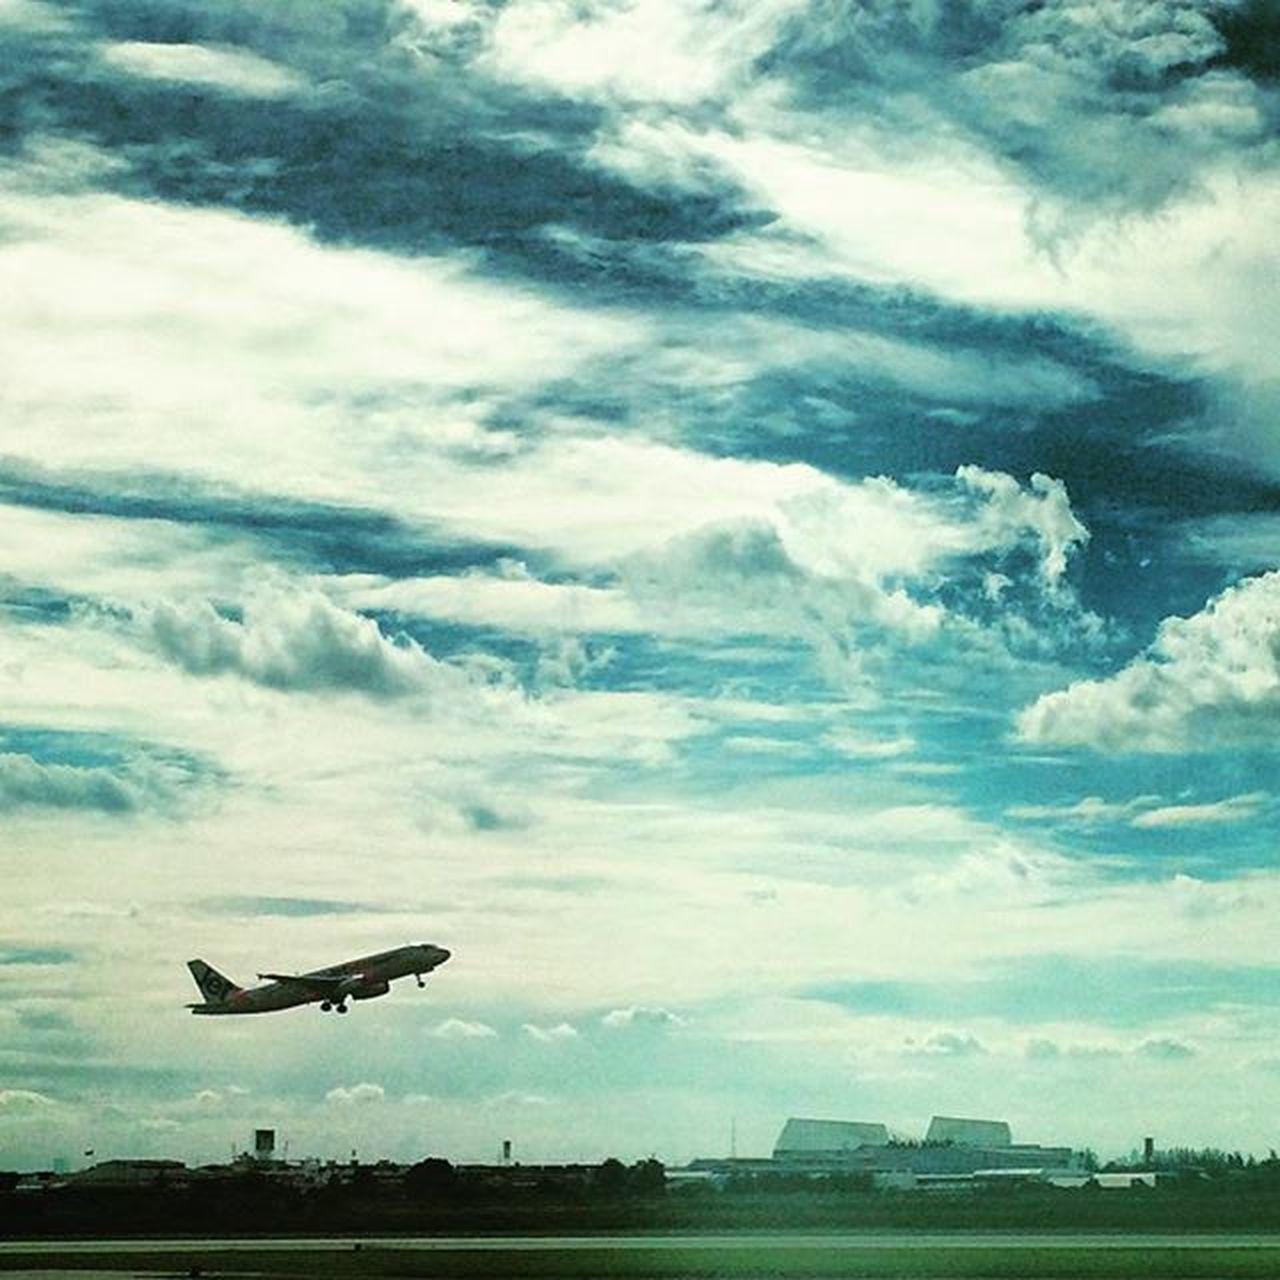 The bird is in the air... Runway Daytravel Foolingaround TakeOff Bird Bangkok Wingsofflight Clouds Leavingground Instagood Instapic Air Airplane Boeing Traveldiary Traveldiarykr7 Travel Theworldguru